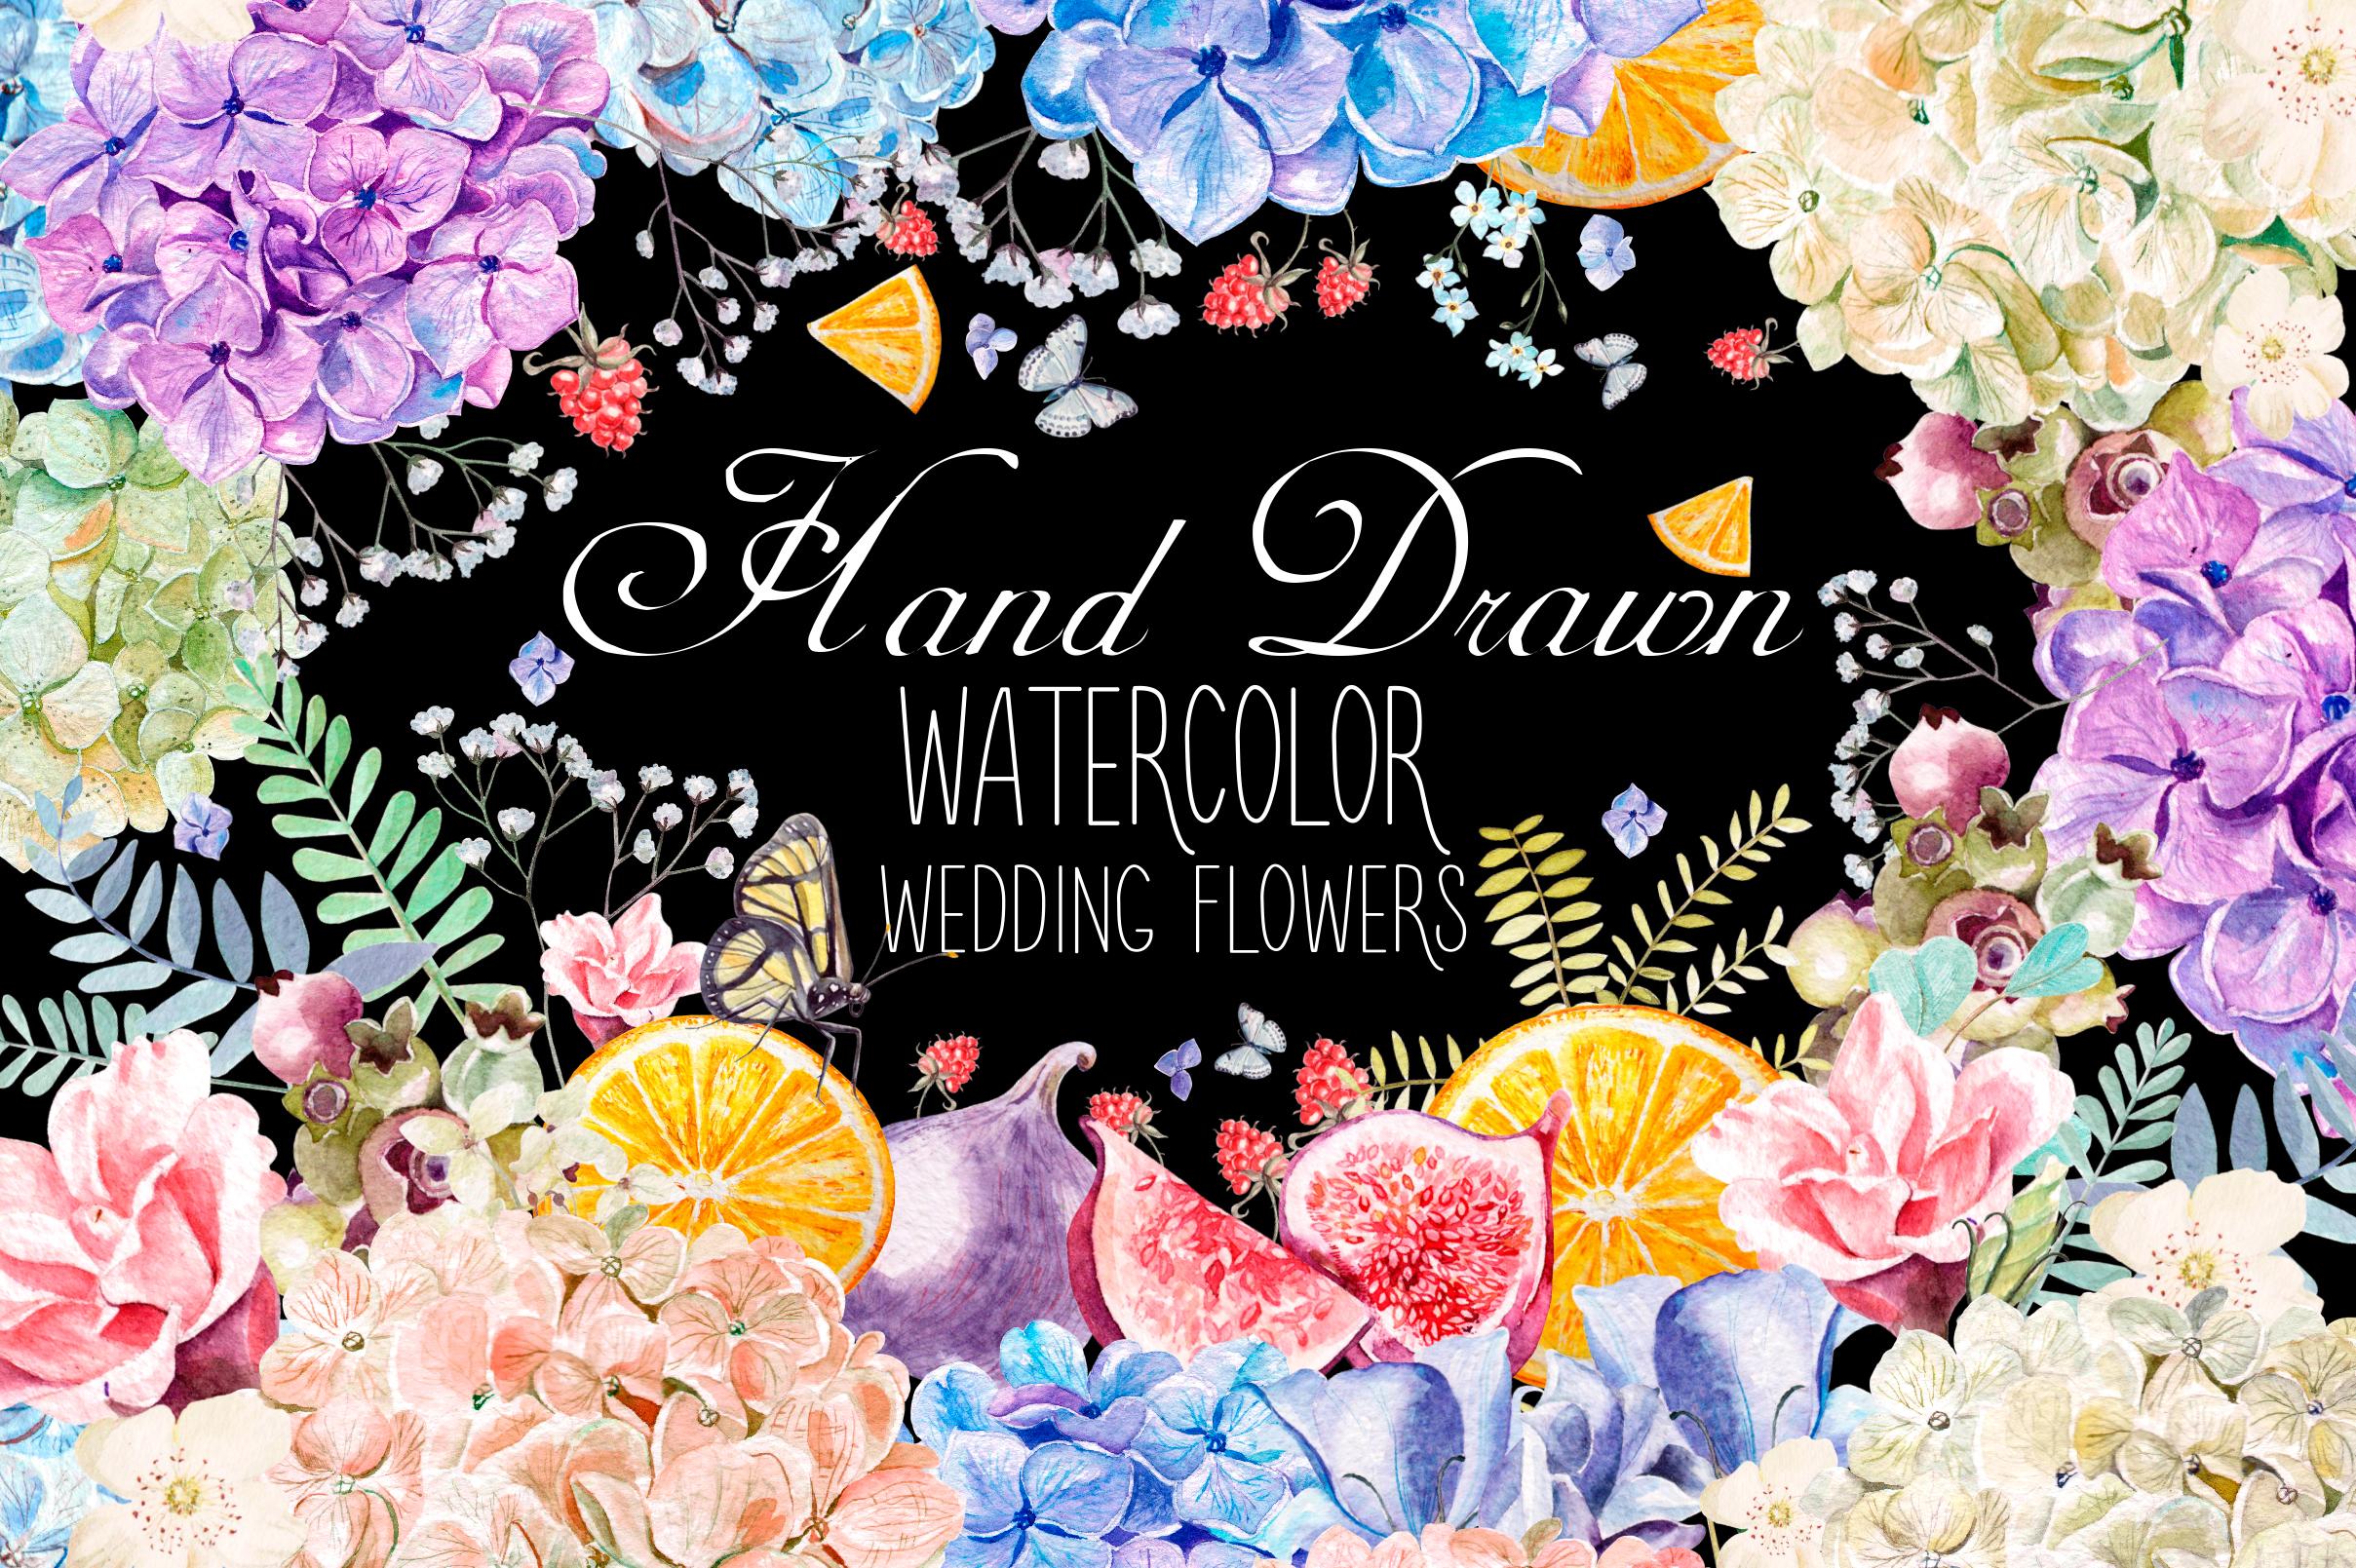 HandDrawn WATERCOLOR Wedding Flowers example image 1